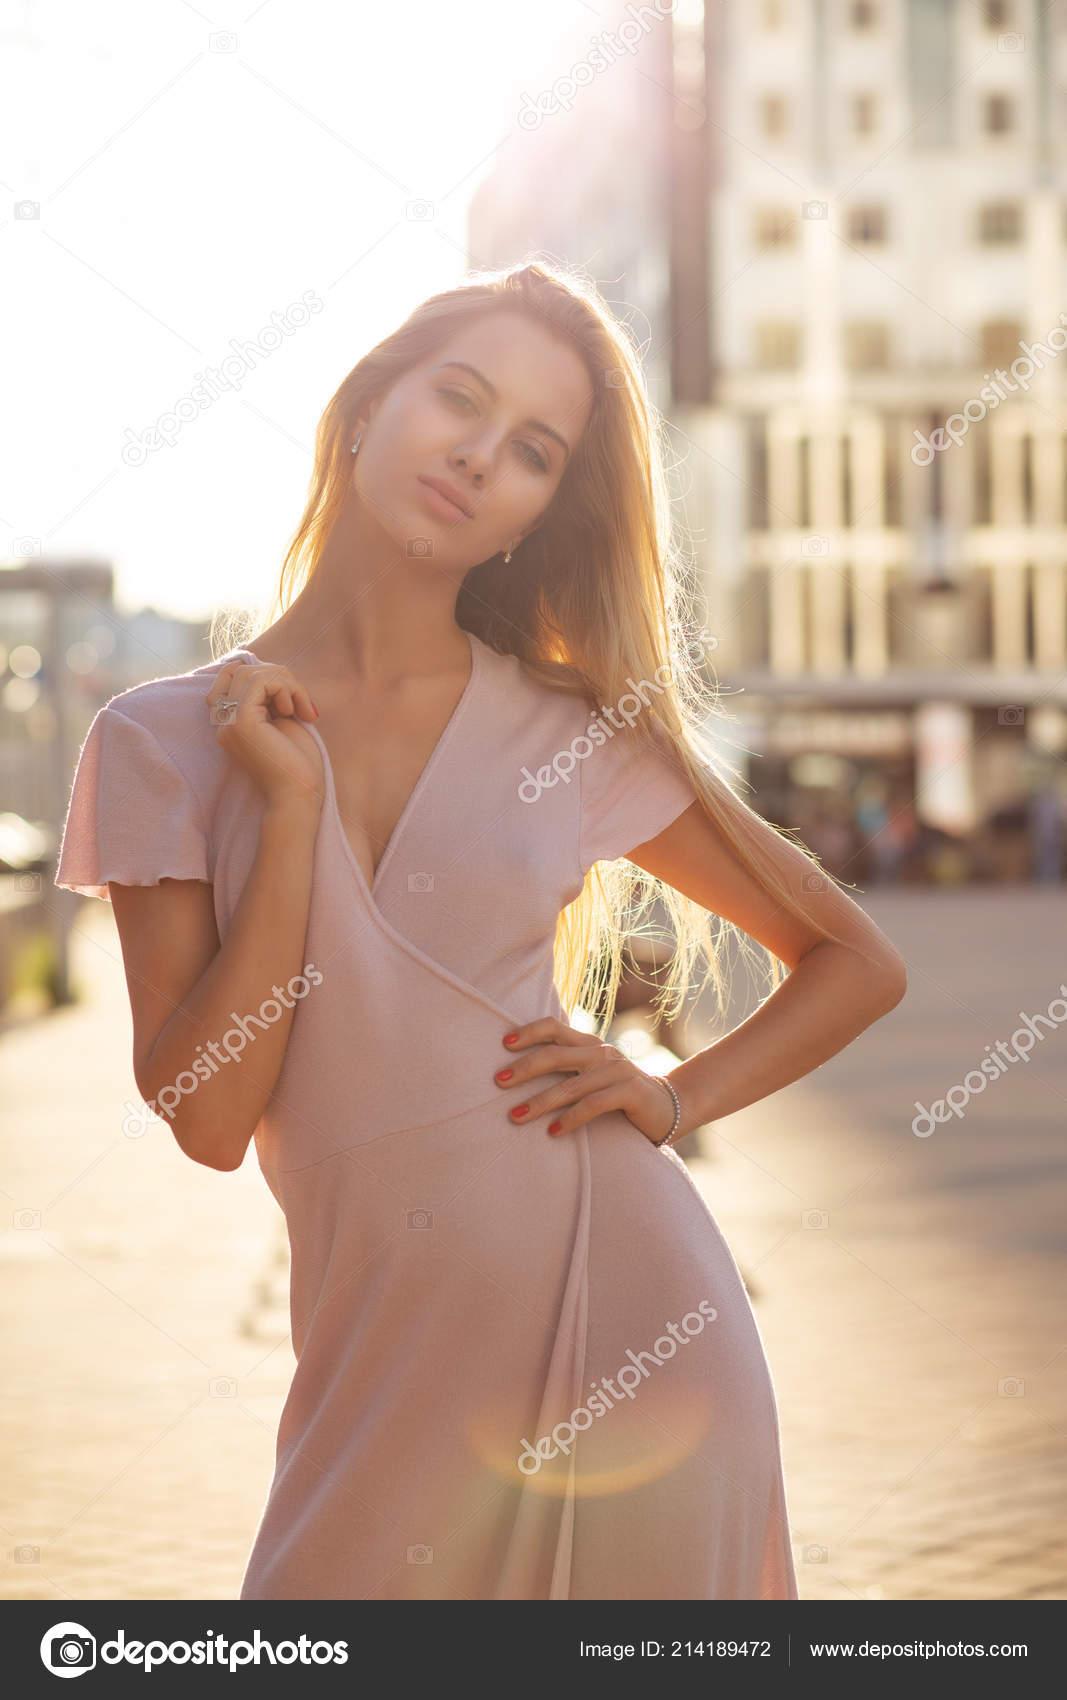 ea43b57d79c5 Ελκυστική ξανθιά γυναίκα που φοράει πλεκτό φόρεμα απολαμβάνοντας ζεστό  καλοκαιρινό βράδυ στην πόλη– εικόνα αρχείου